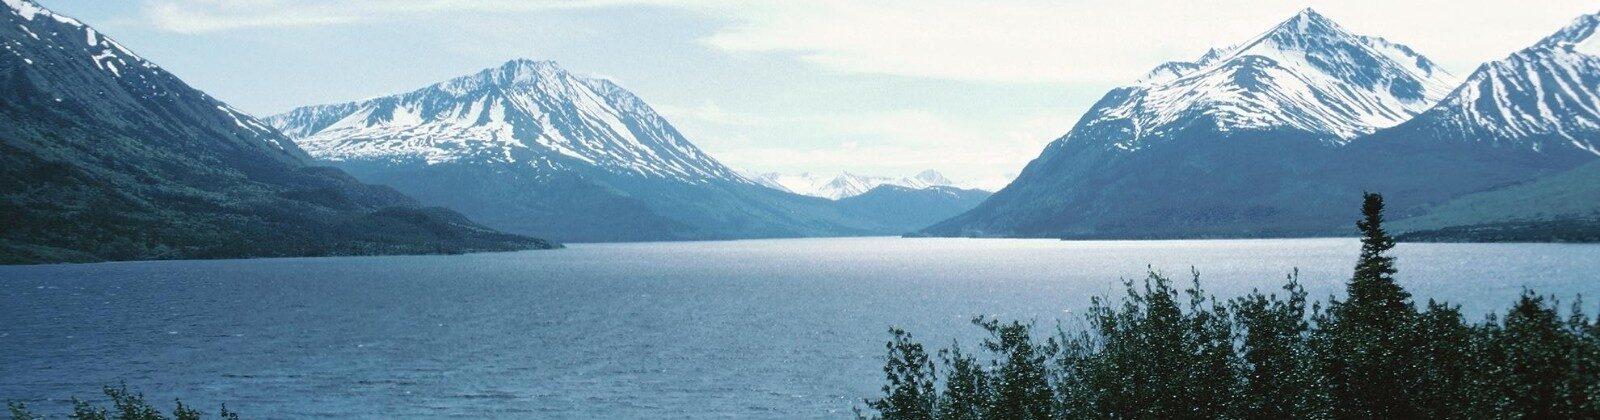 canada west coast mountains